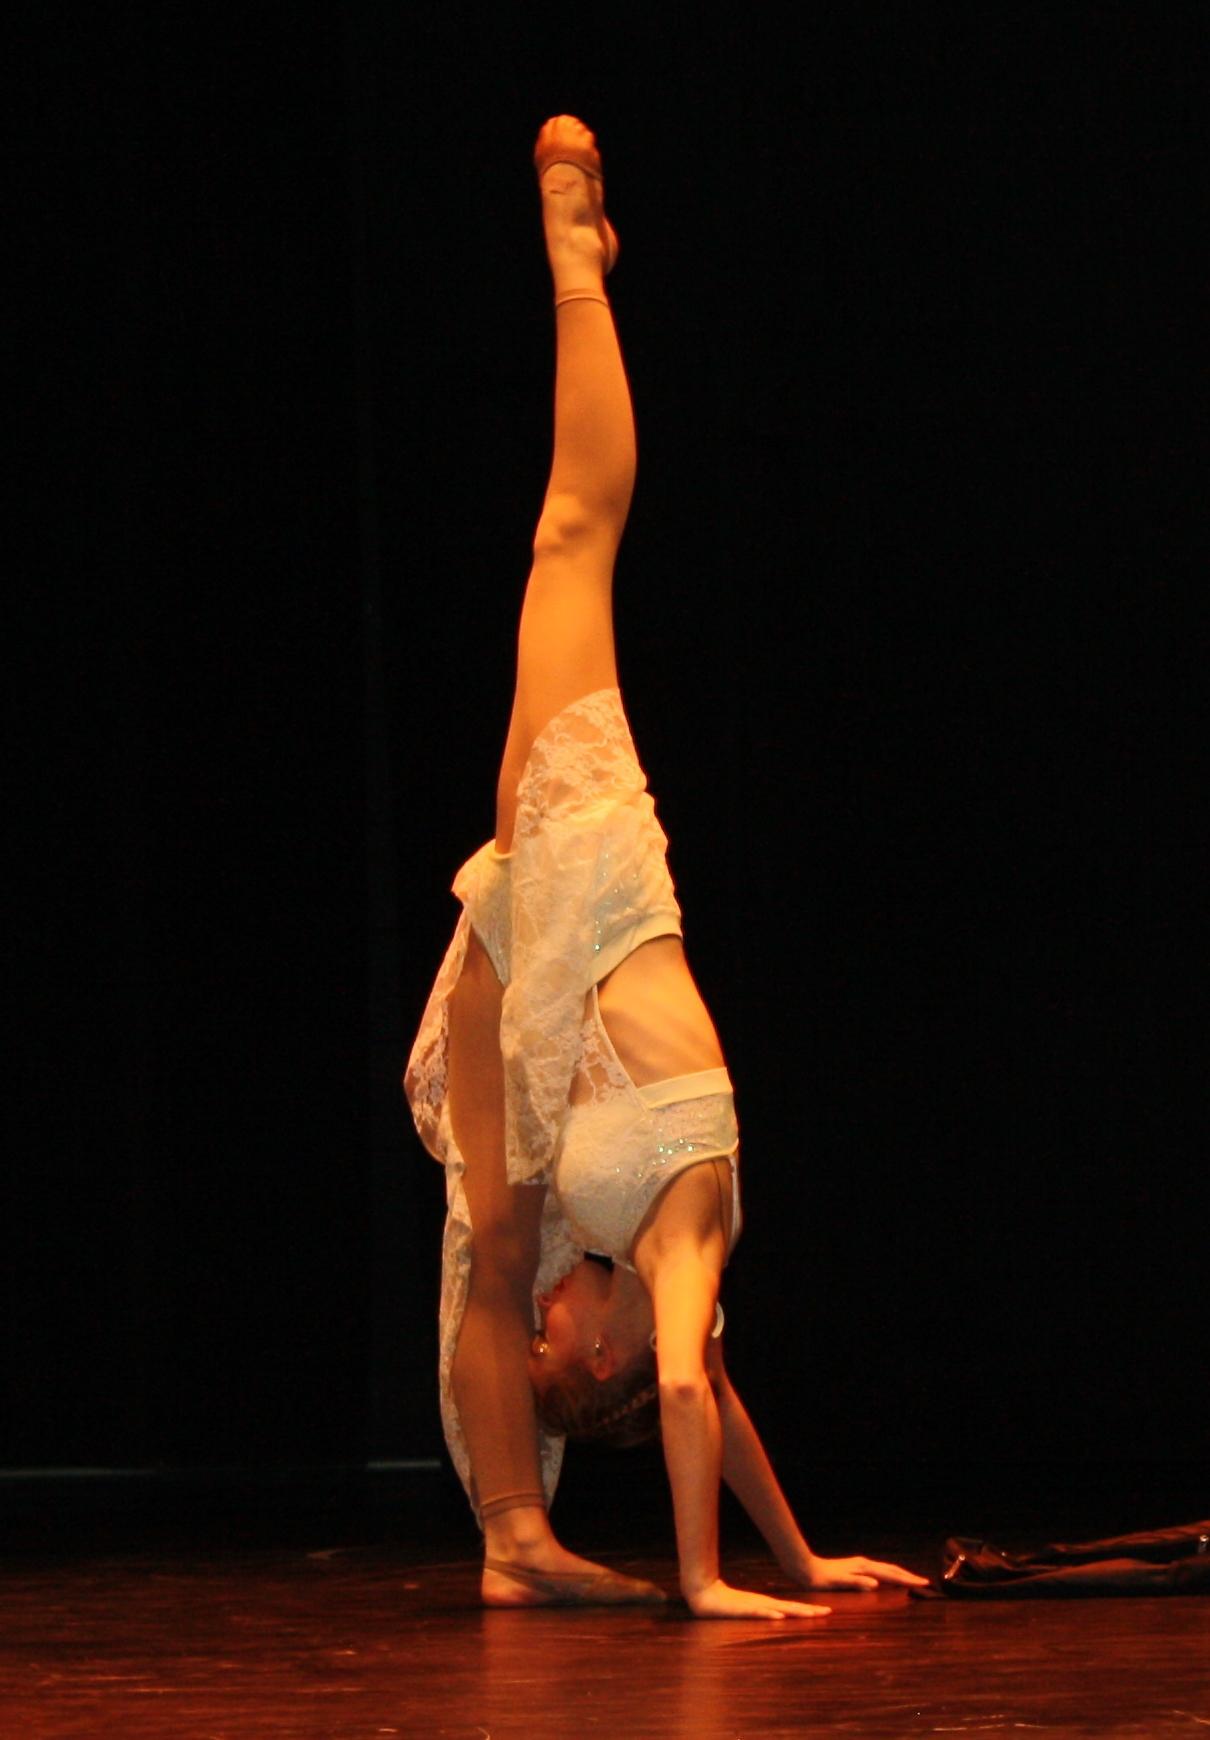 Rachael Carlton Studio 1 Elite Dancer